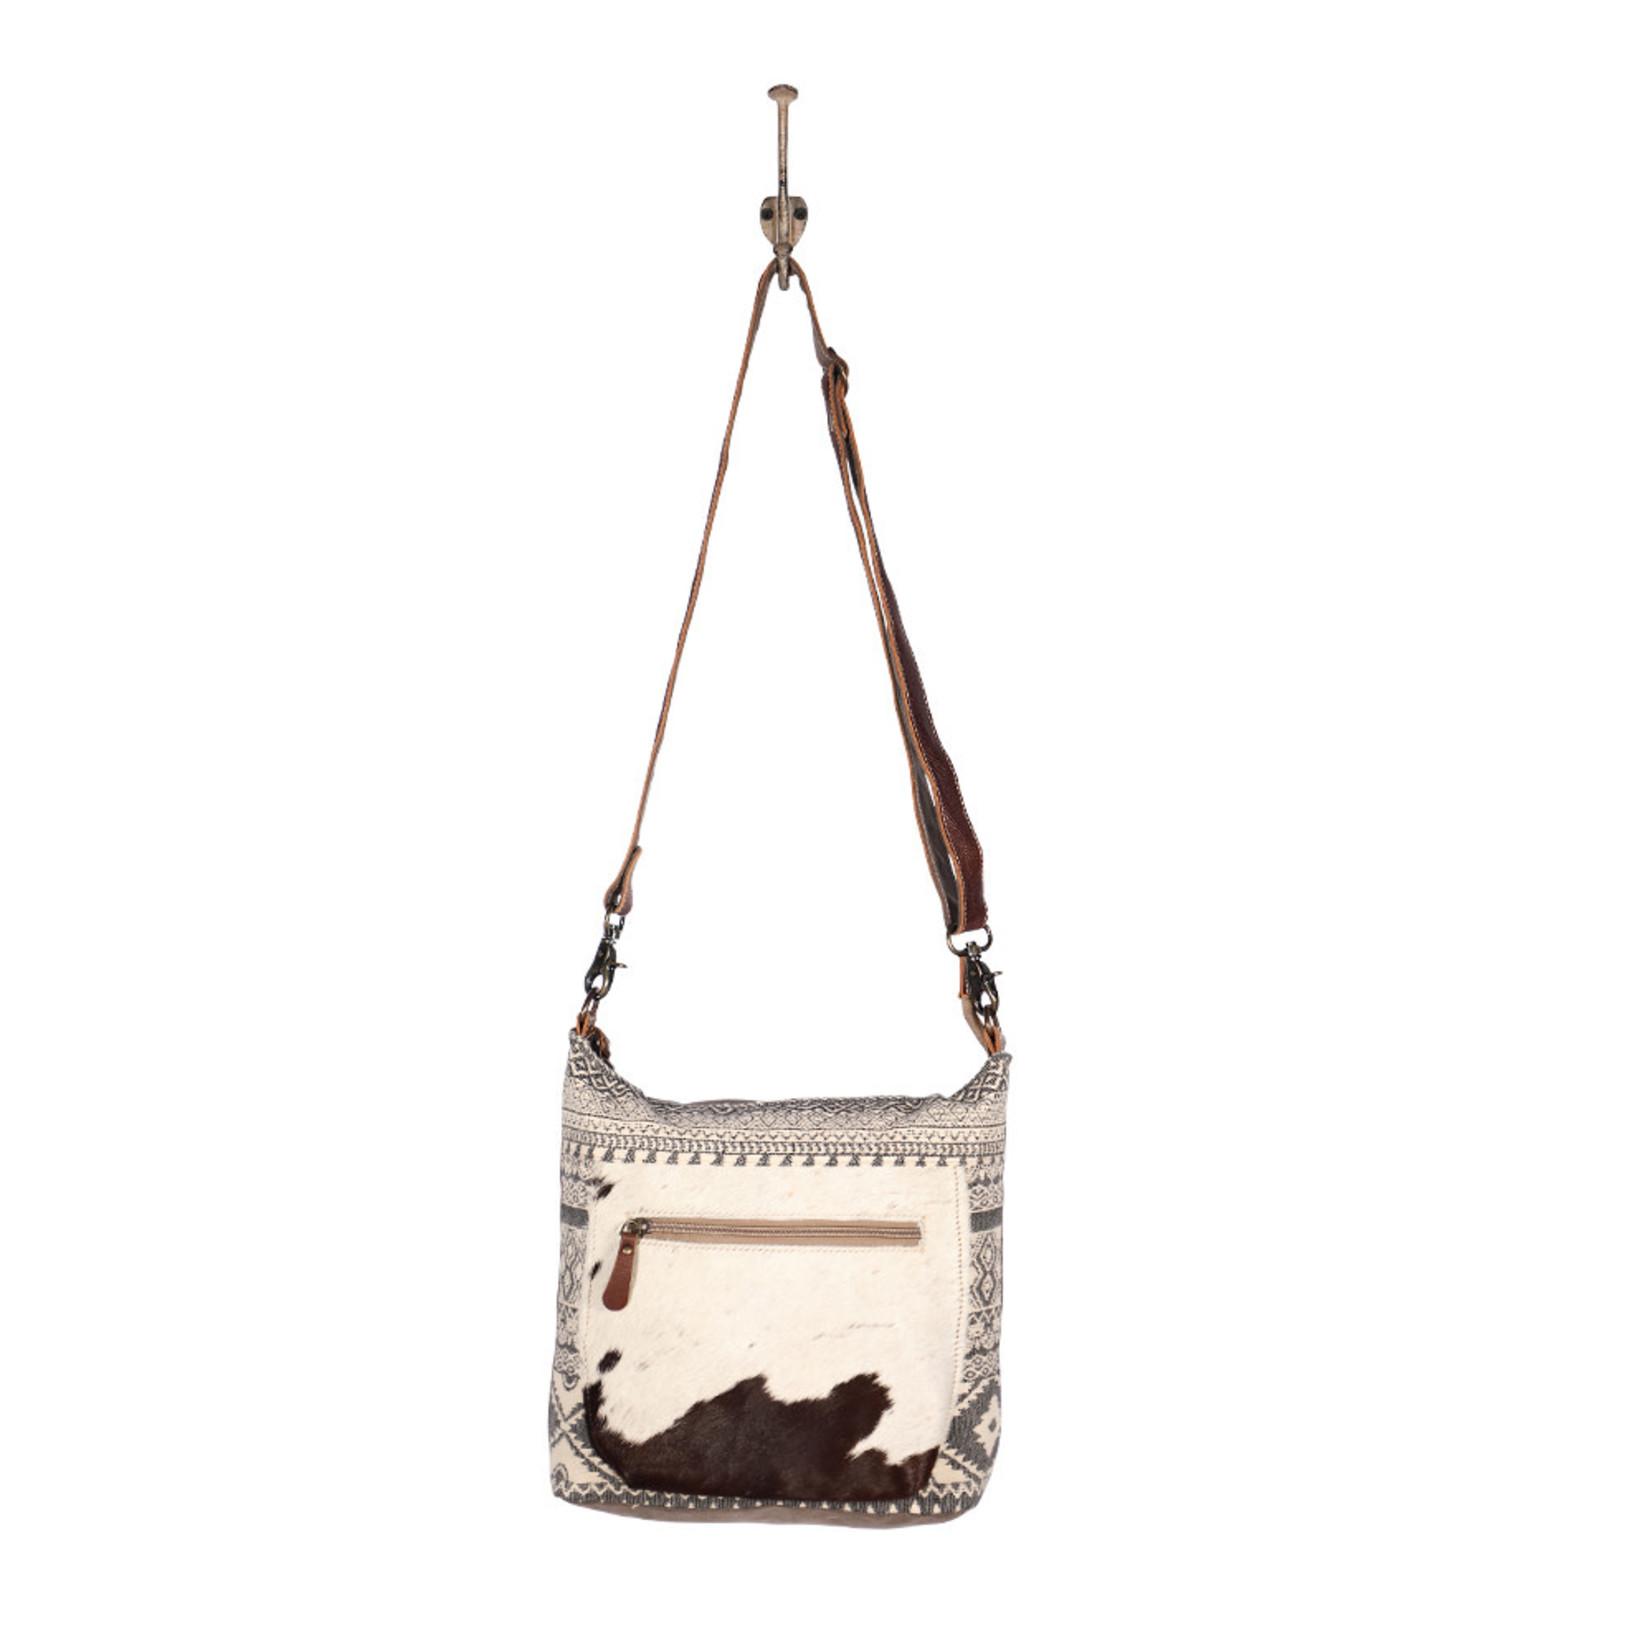 Myra Bags S-1947 Buster Shoulder Bag